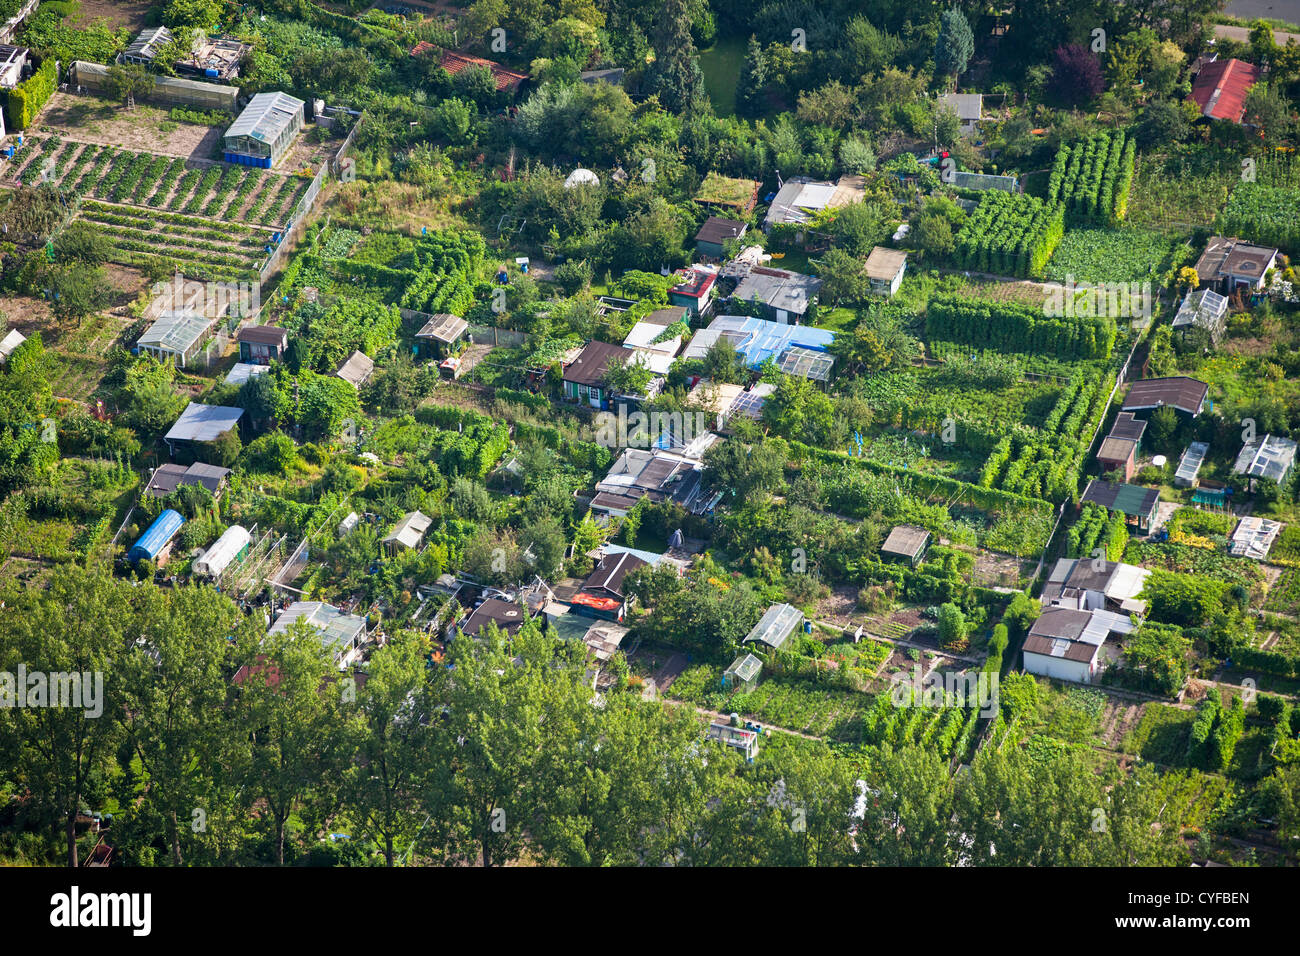 Den Niederlanden, Oud-Zuilen. Schrebergärten. Luft. Stockbild